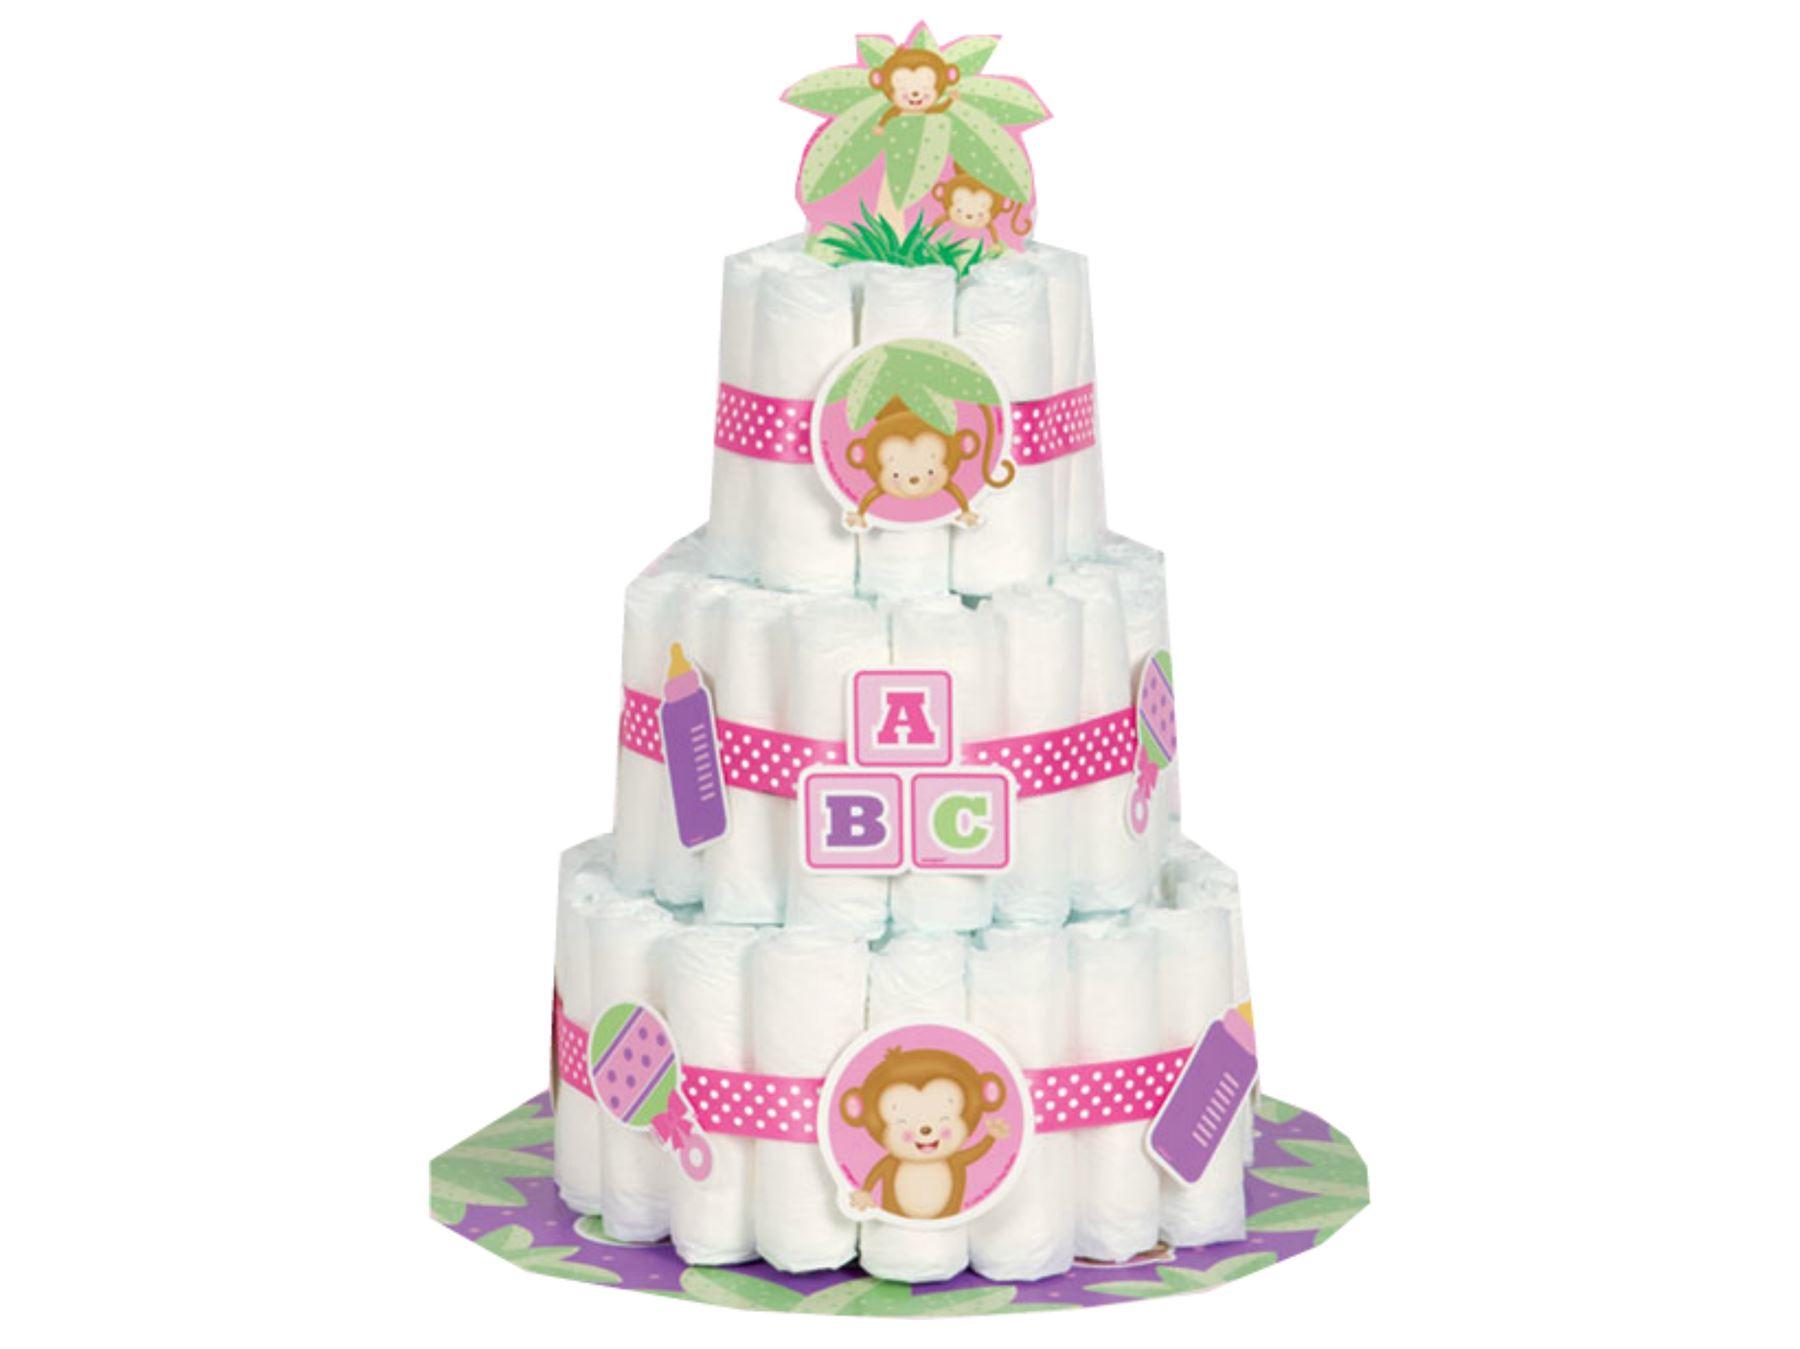 Baby Shower Cake Decoration Kits : Girl Nappy Cake Kit - Baby Shower Party Decoration Supplies